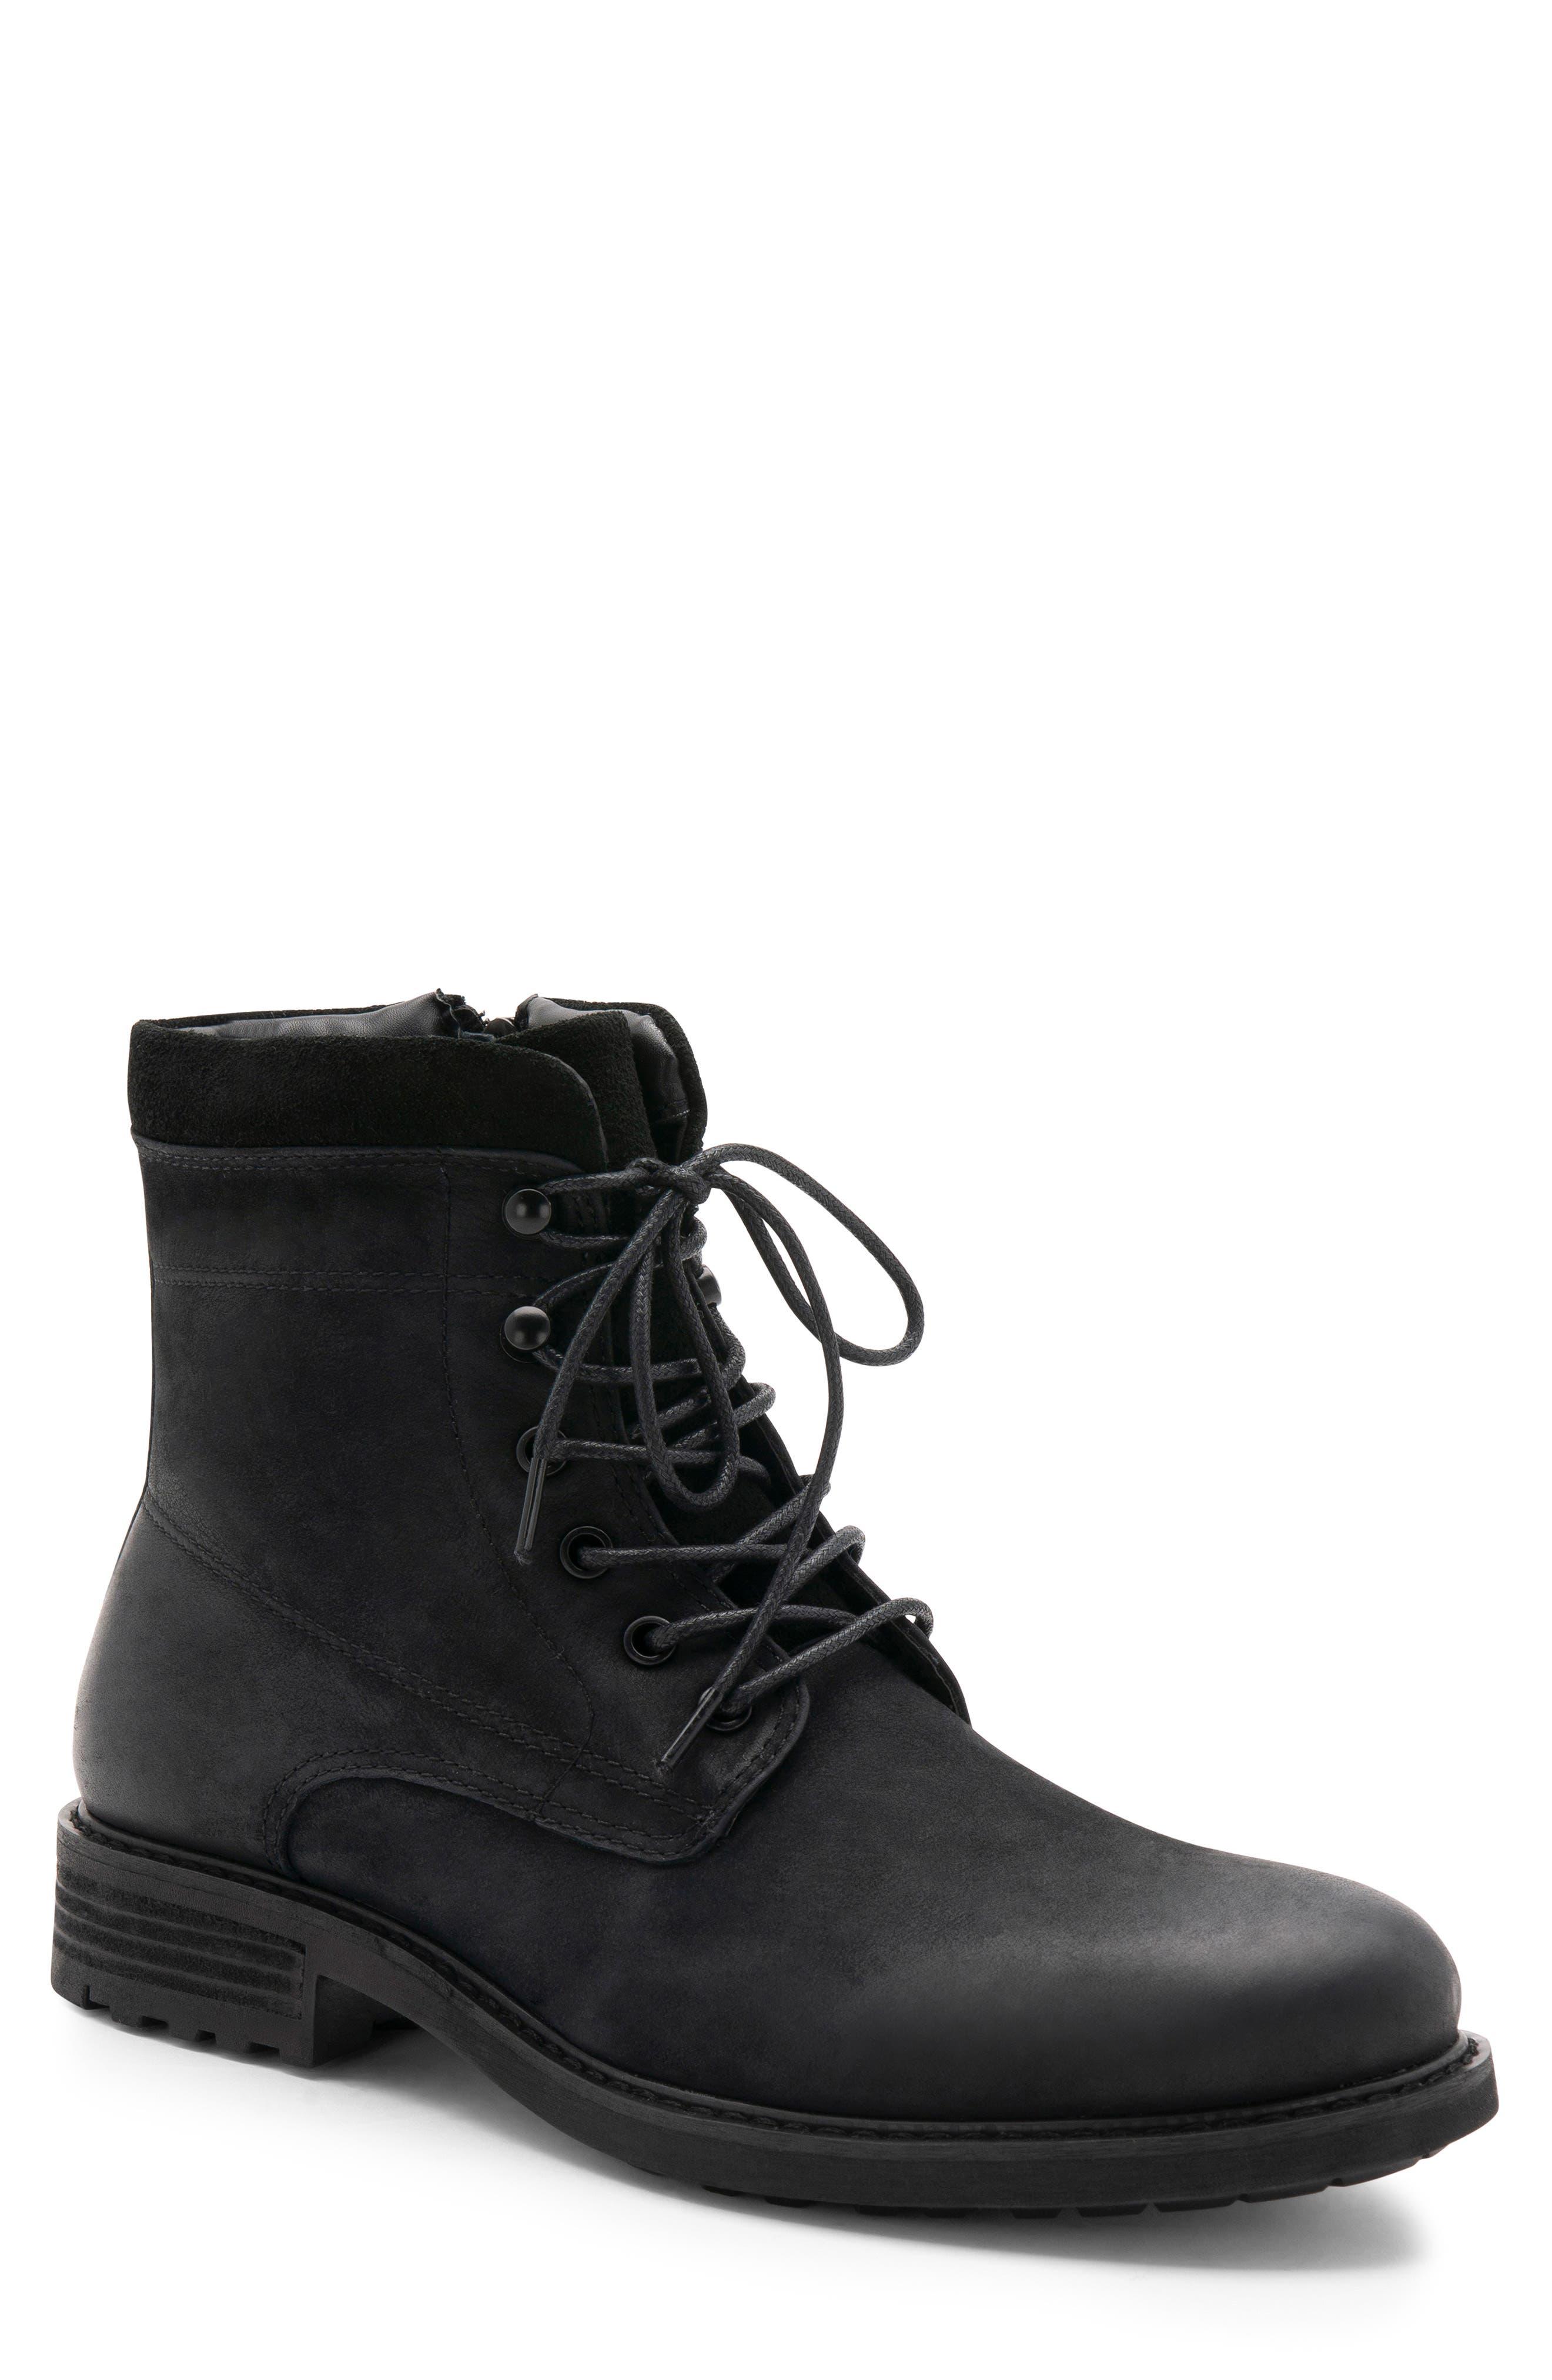 Patton Waterproof Plain Toe Boot,                             Main thumbnail 1, color,                             BLACK NUBUCK